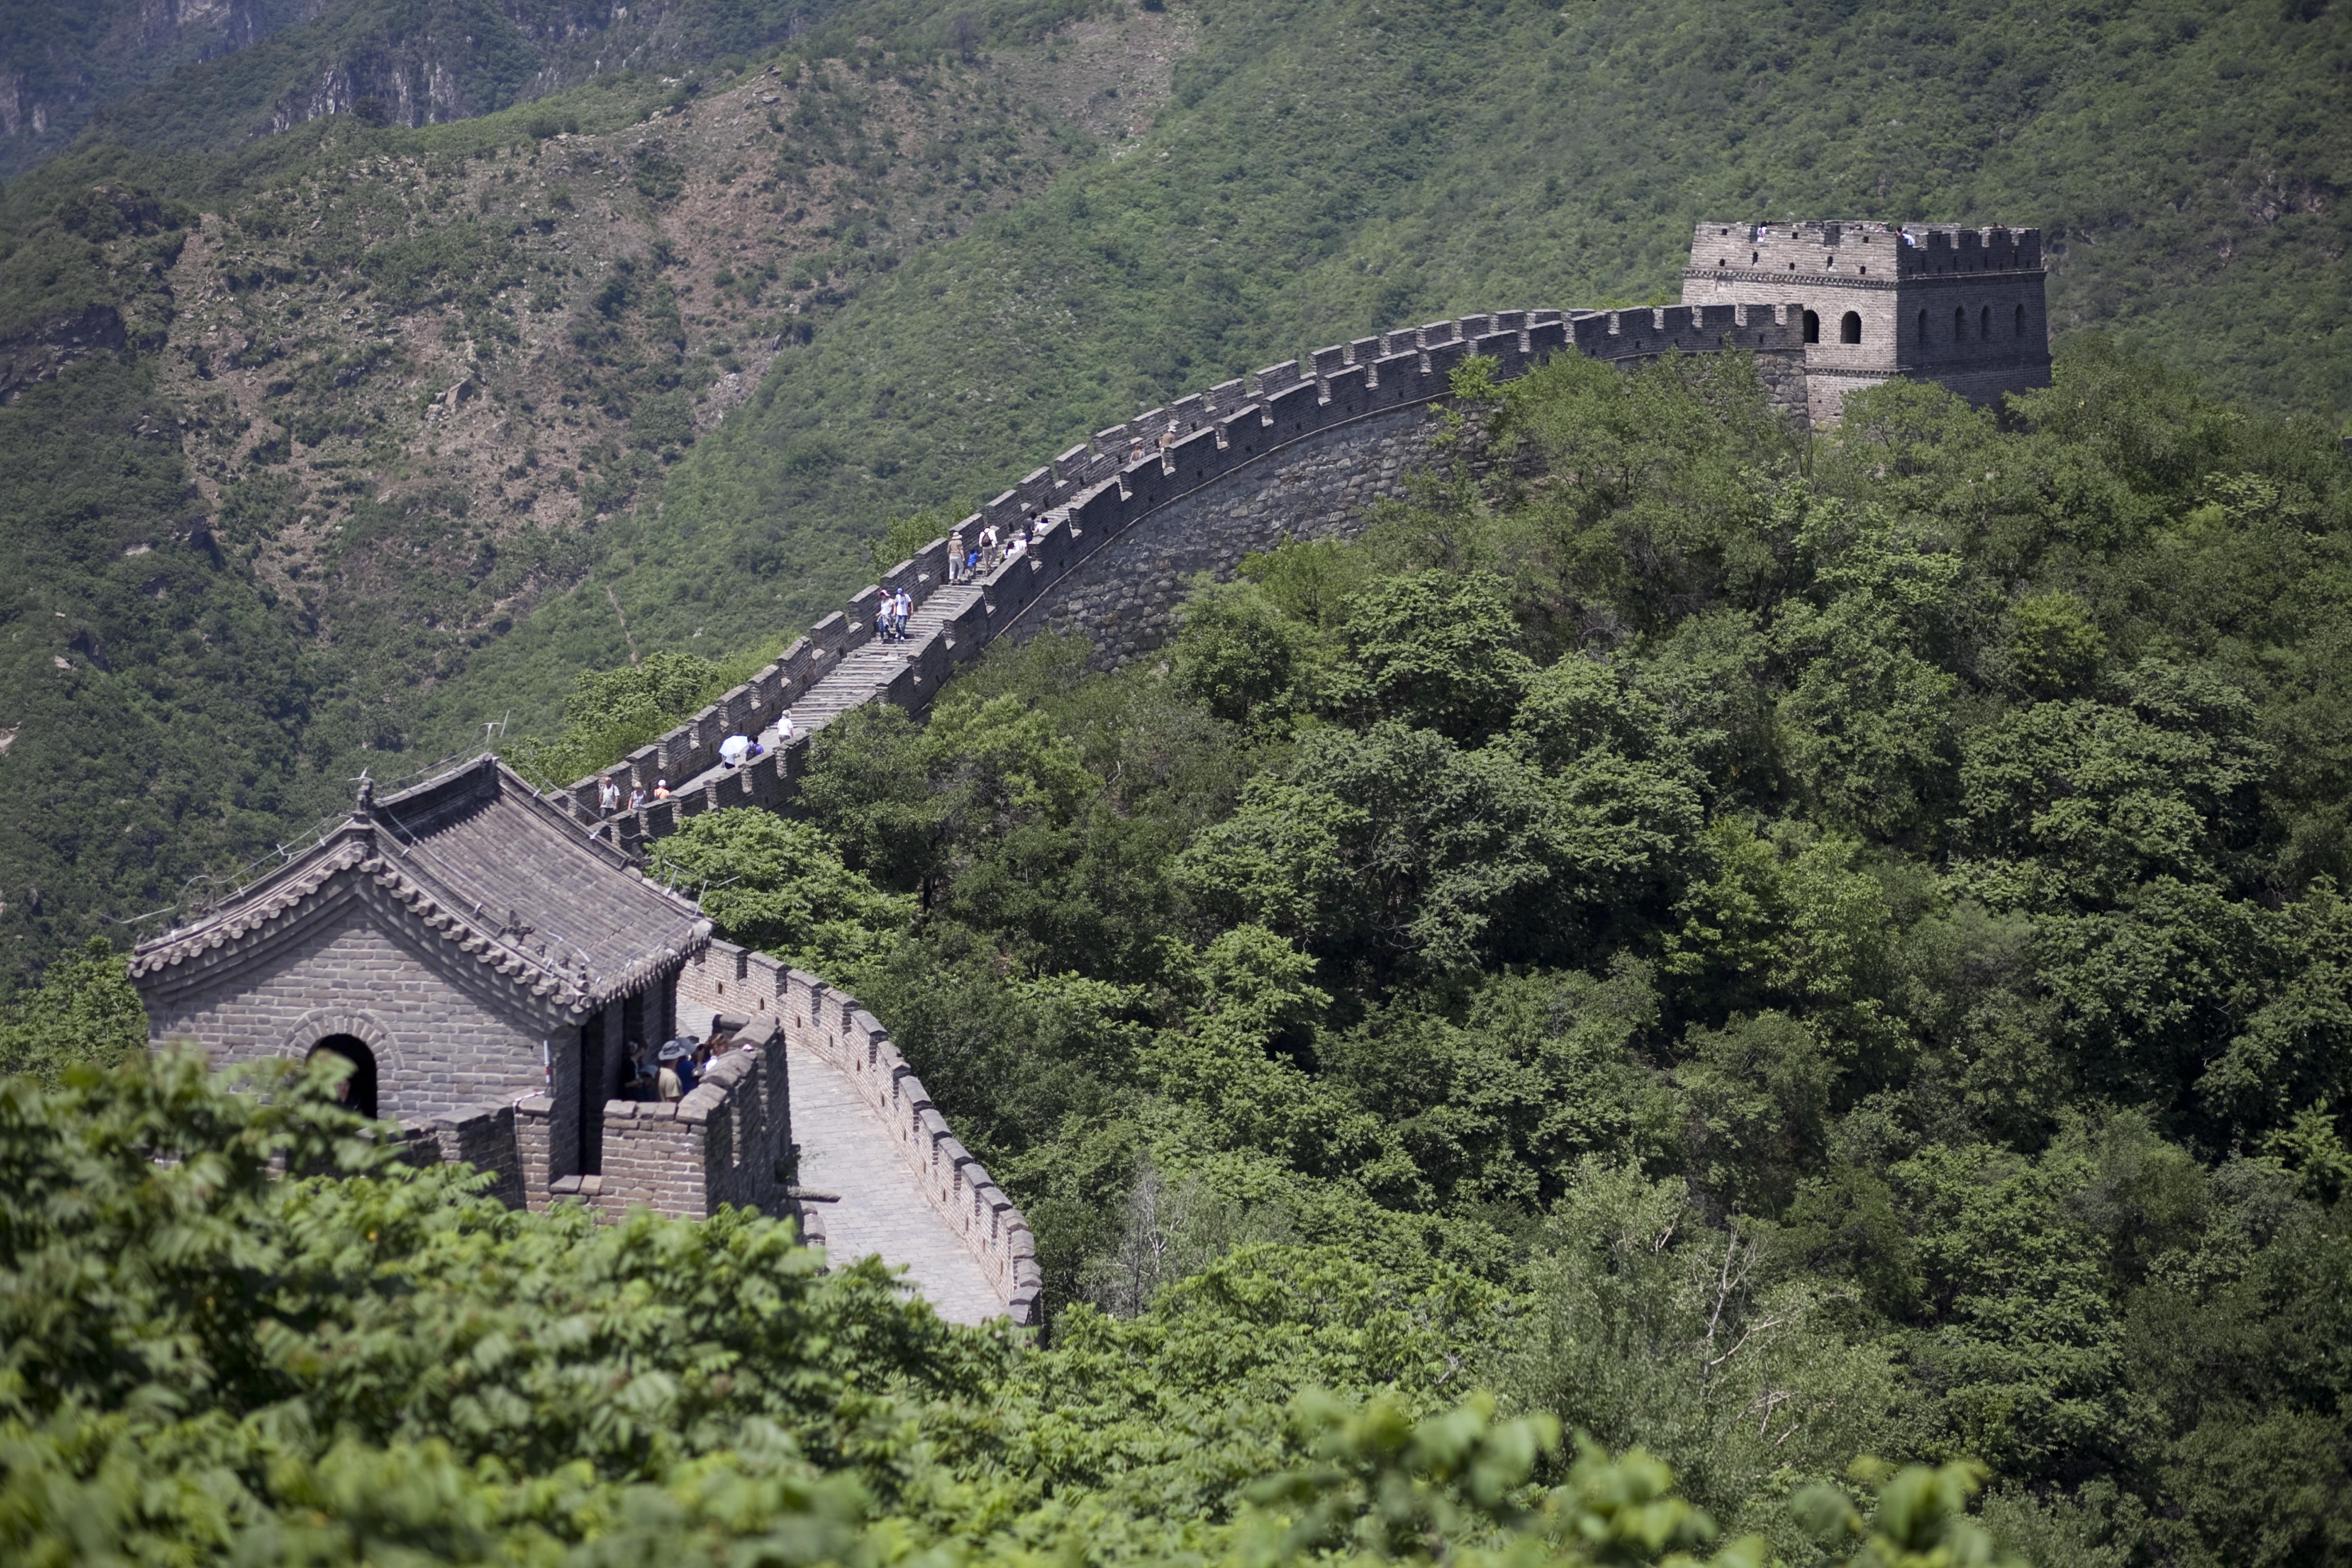 MAYMESTER: SOCIAL ENTREPRENEURSHIP IN CHINA Image